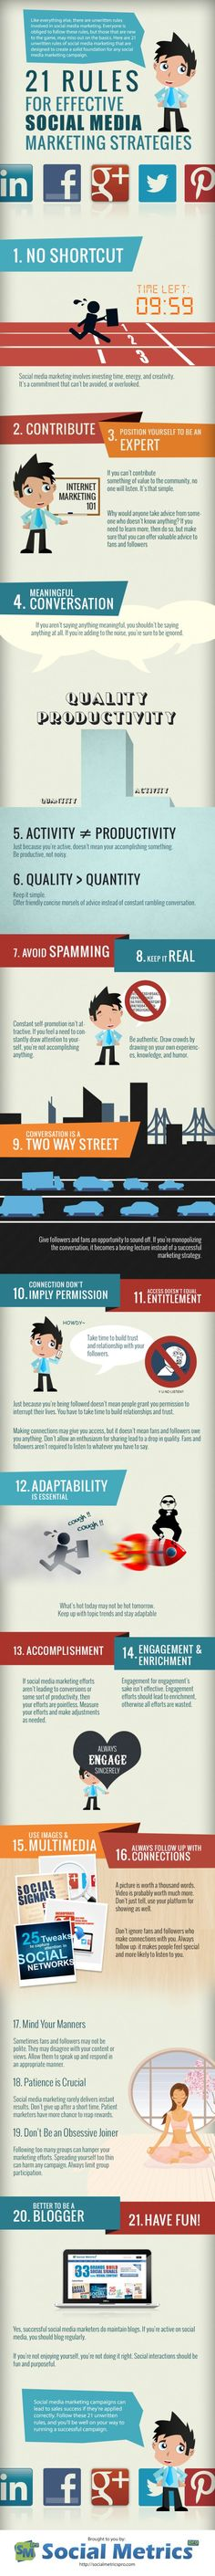 Stop the SPAM on Social Media #socialmedia #marketing